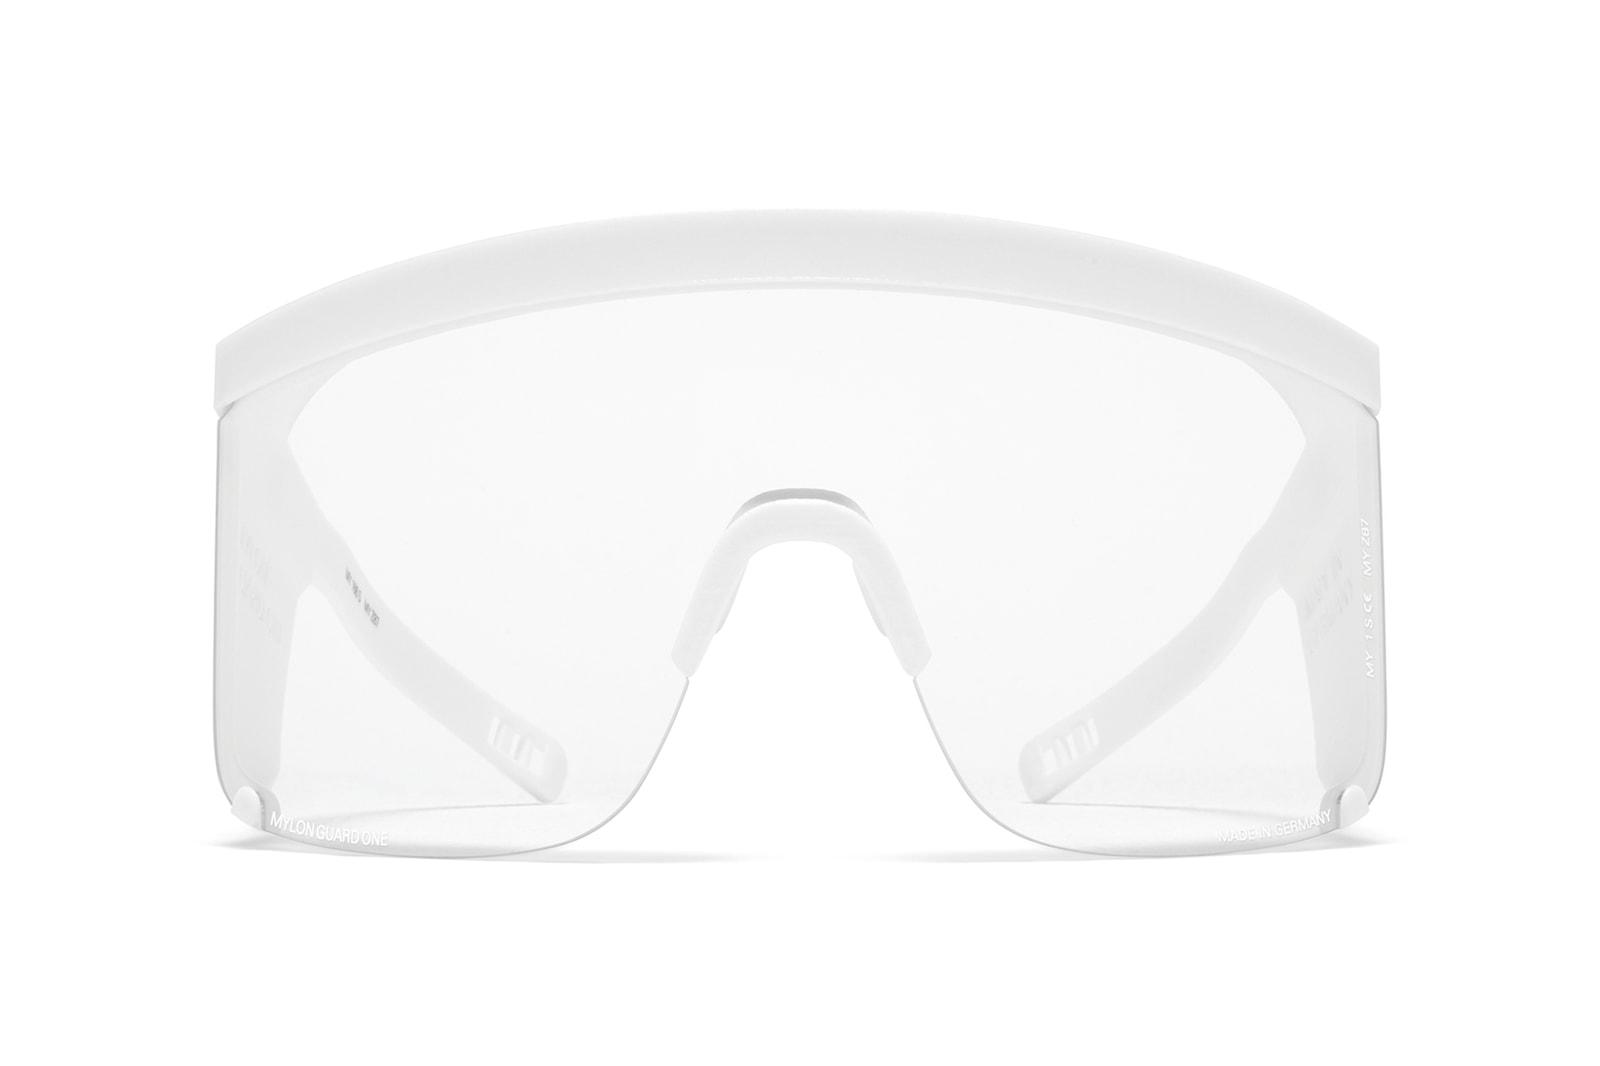 MYKITA Mylon Guard One Safety Glasses Shield PPE Protective Eyewear Coronavirus COVID-19